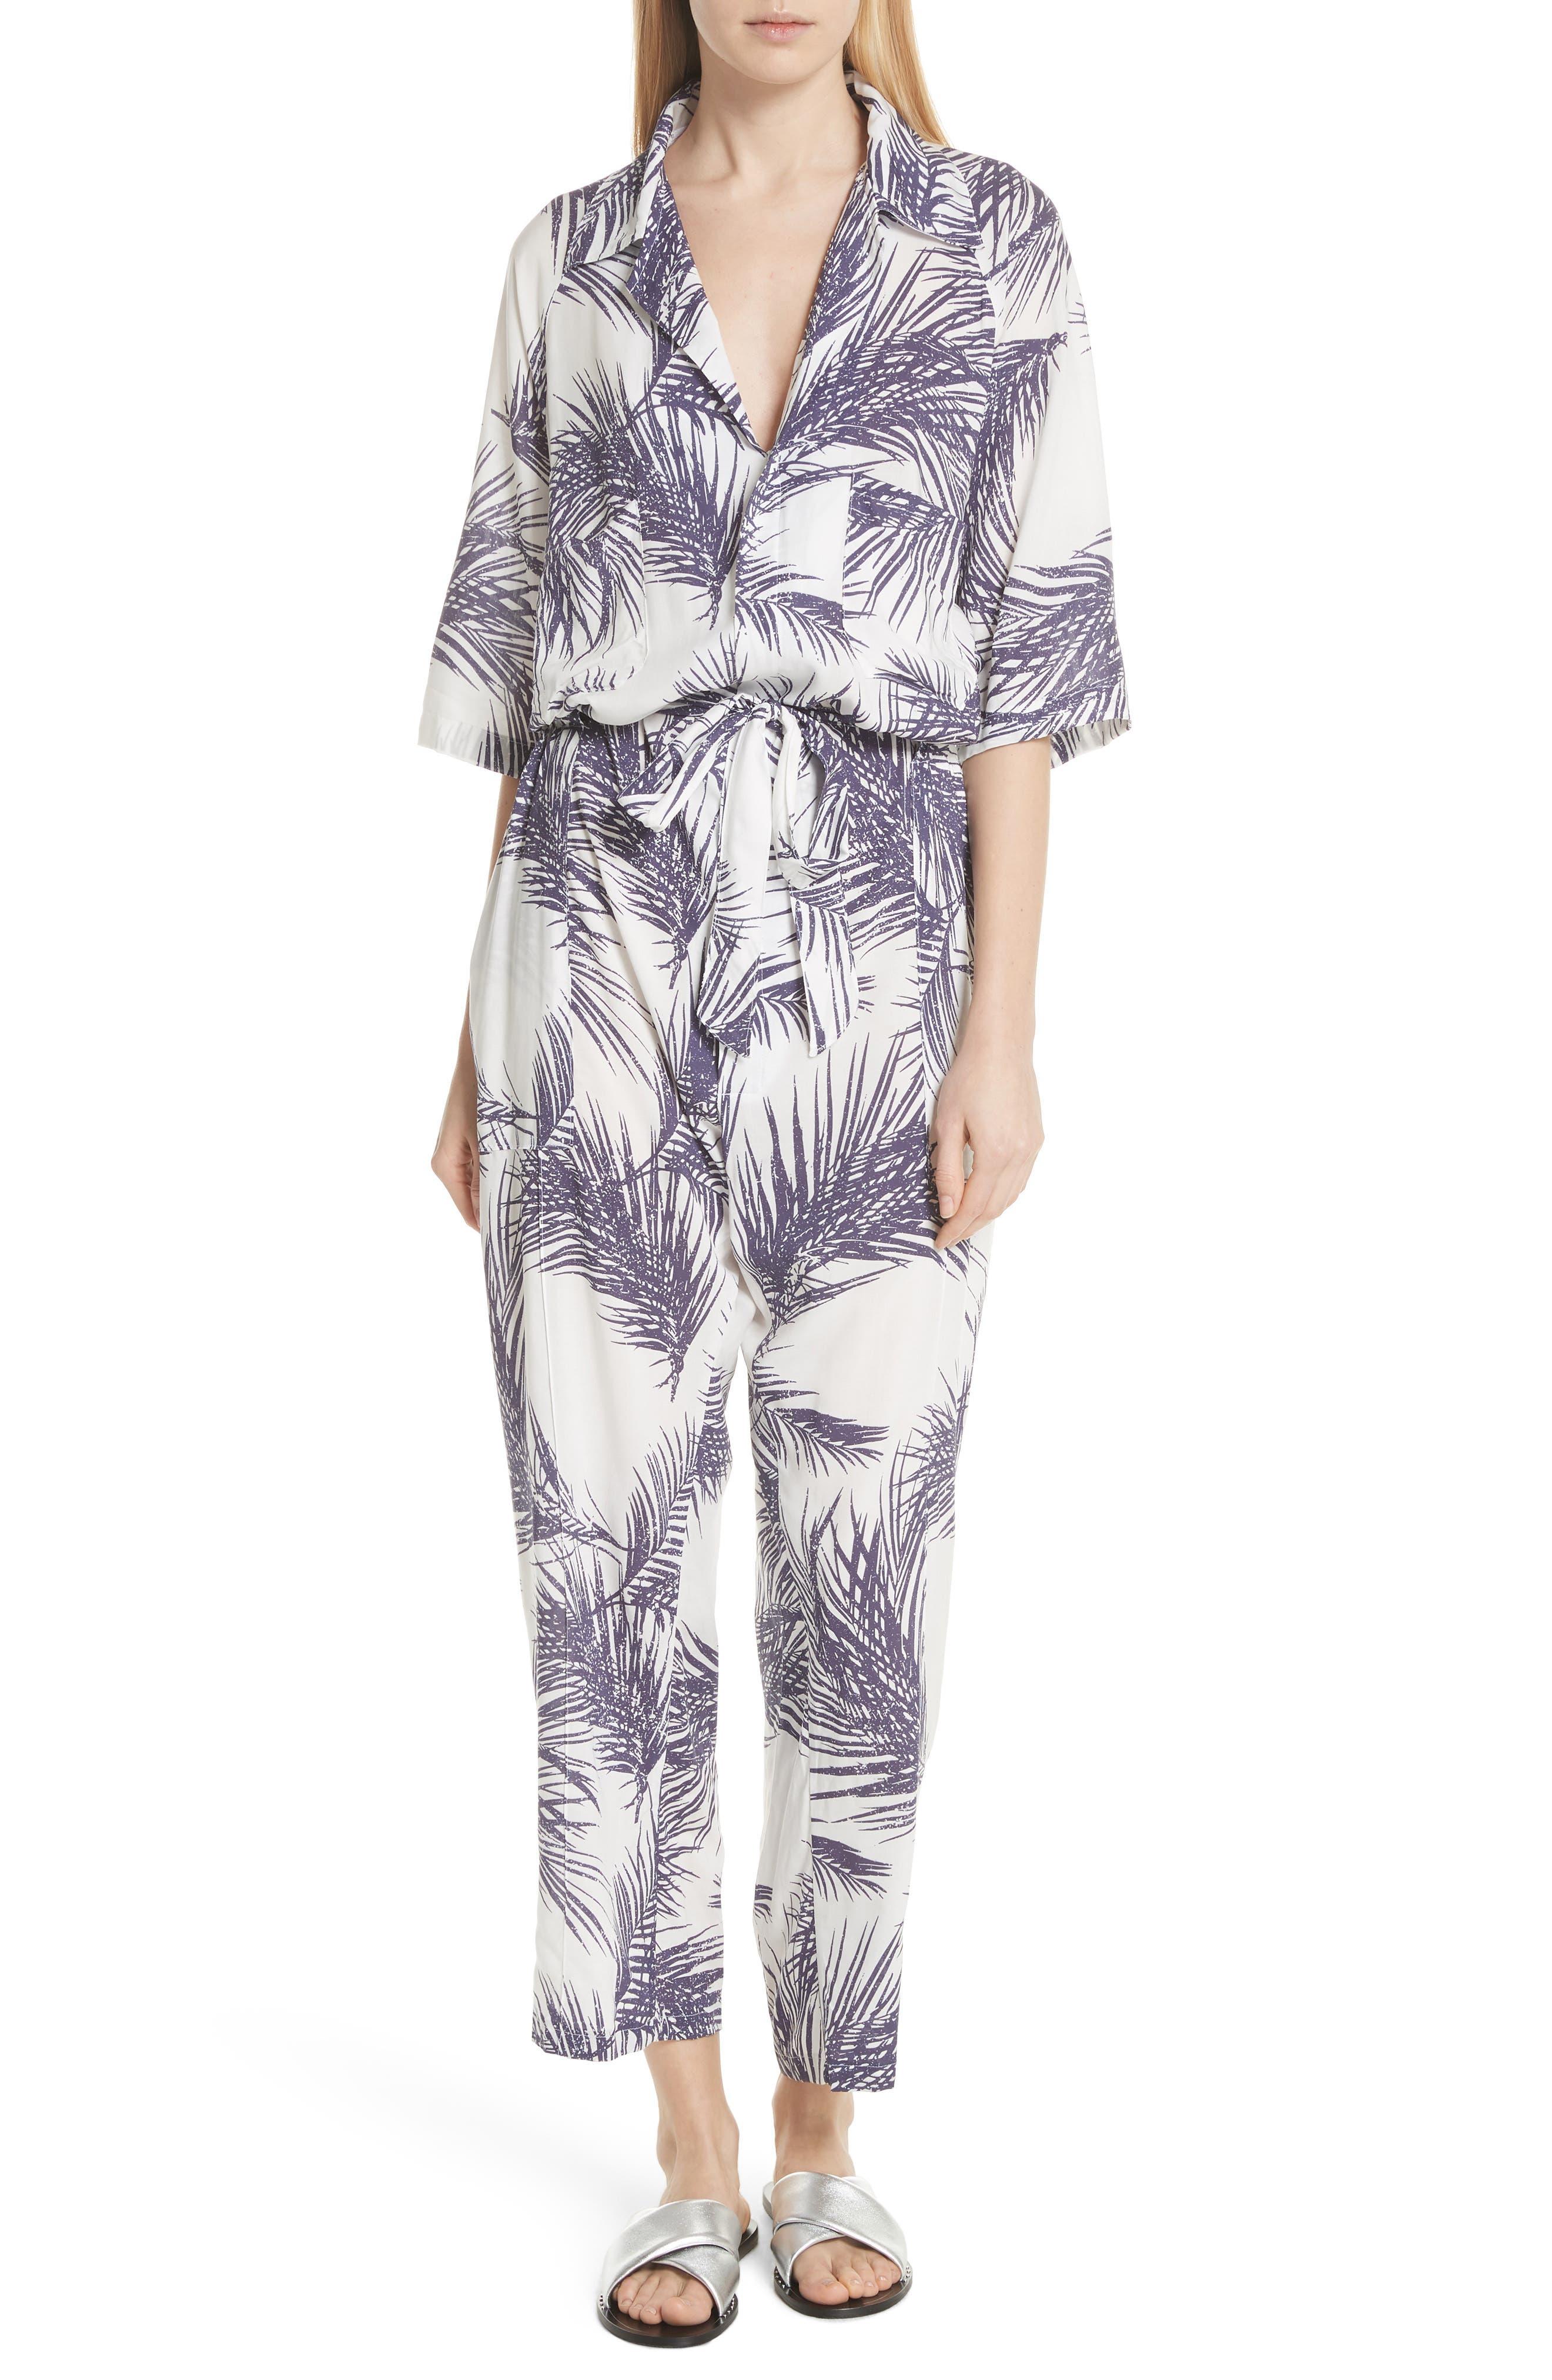 Apres Beach Print Jumpsuit,                         Main,                         color, White/ Dark Purple